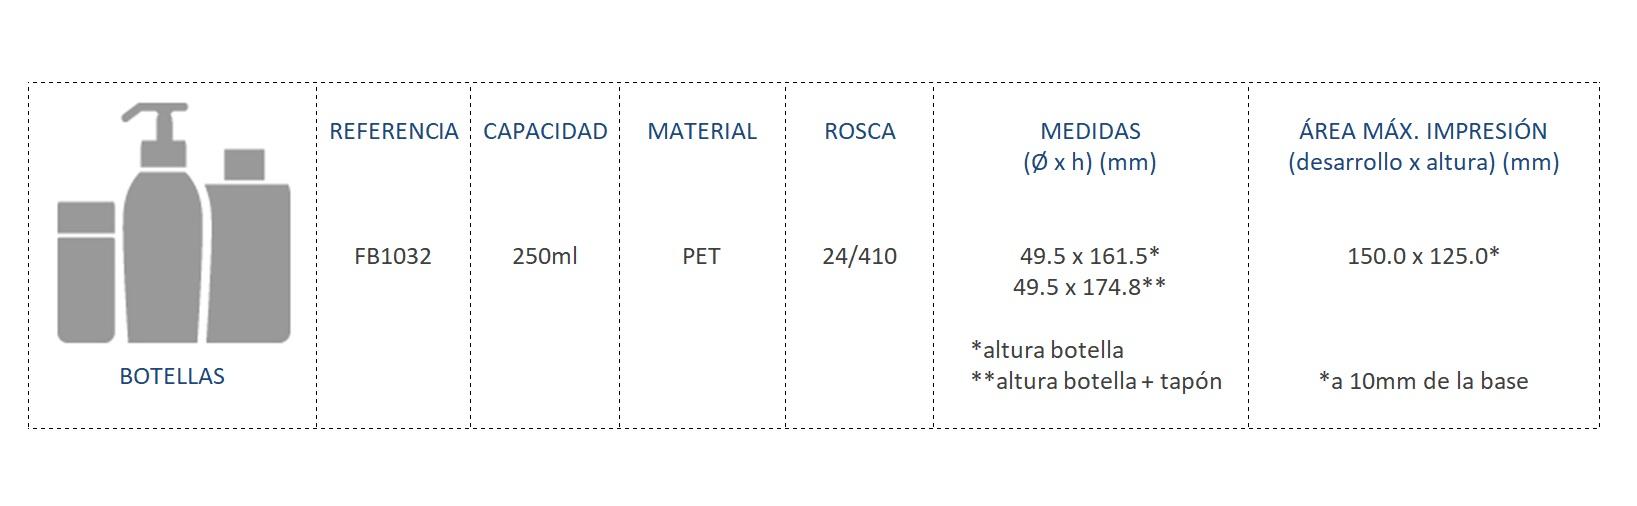 Cuadro de Materiales Botella FB1032